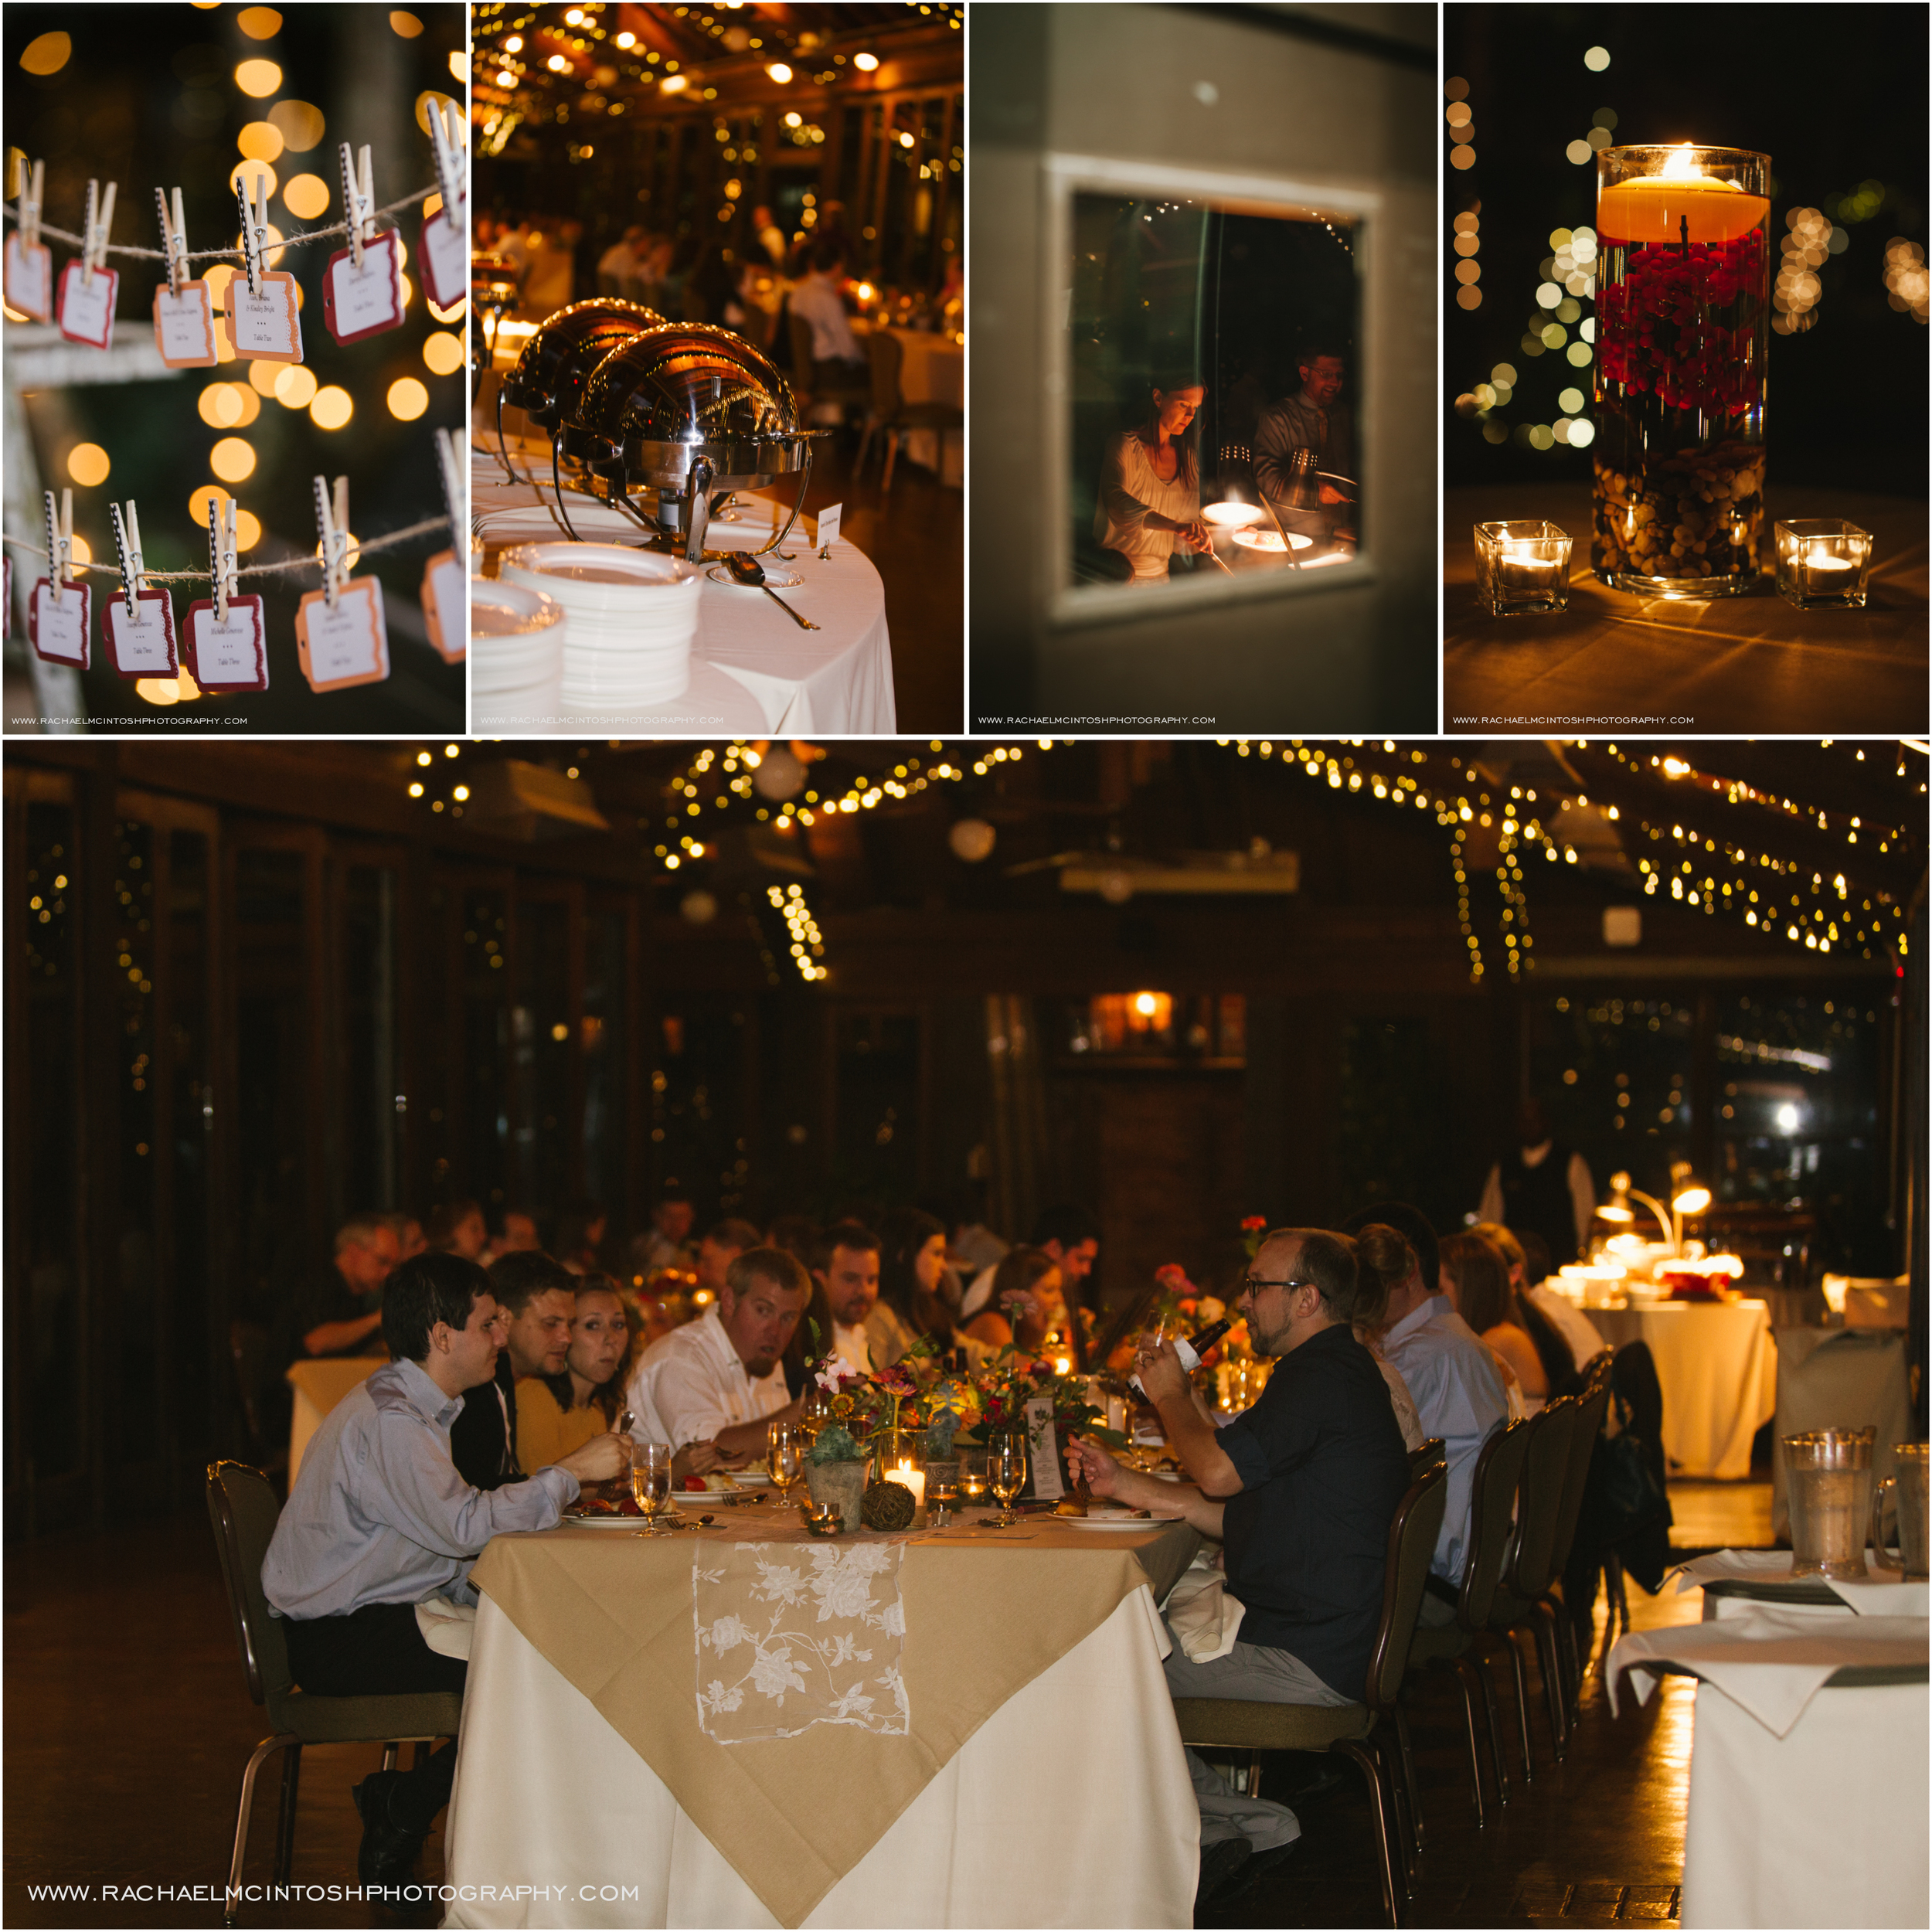 Biltmore Rehearsal Dinner-Asheville Wedding Photographer-Rachael McIntosh Photography 7.jpg